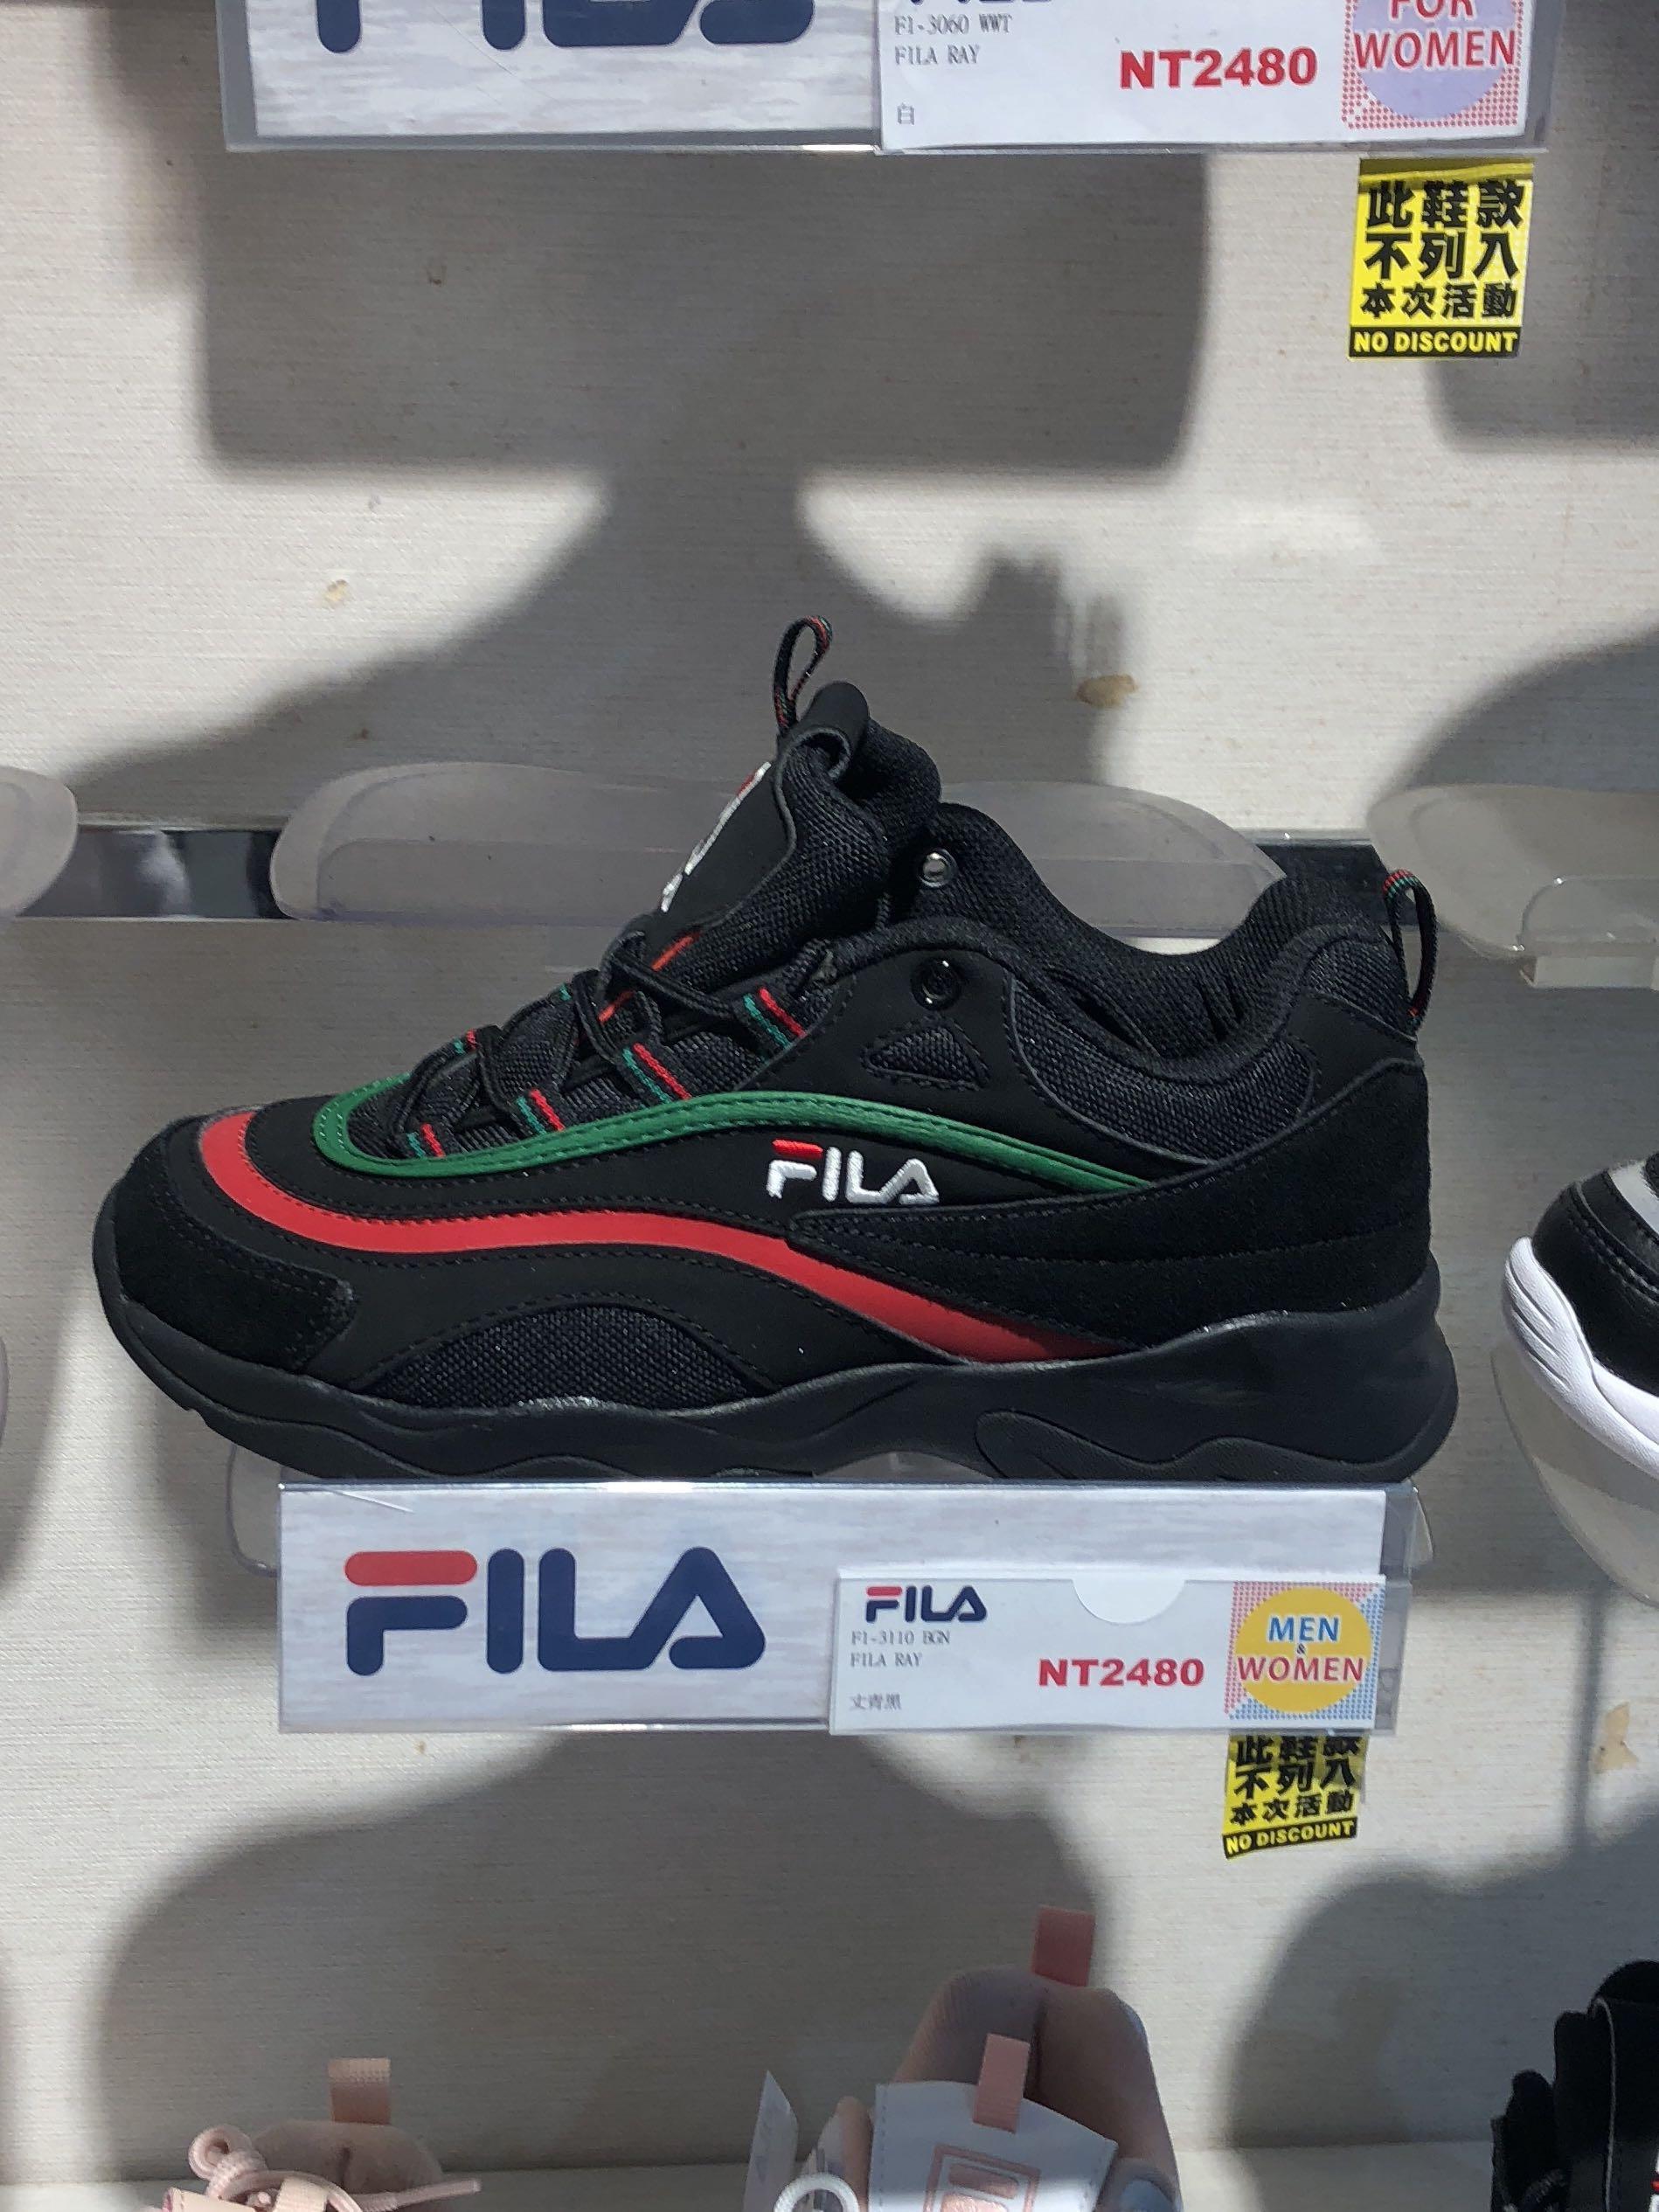 96513c7b6d8 Fila Ray Disruptor, Men's Fashion, Footwear, Sneakers on Carousell